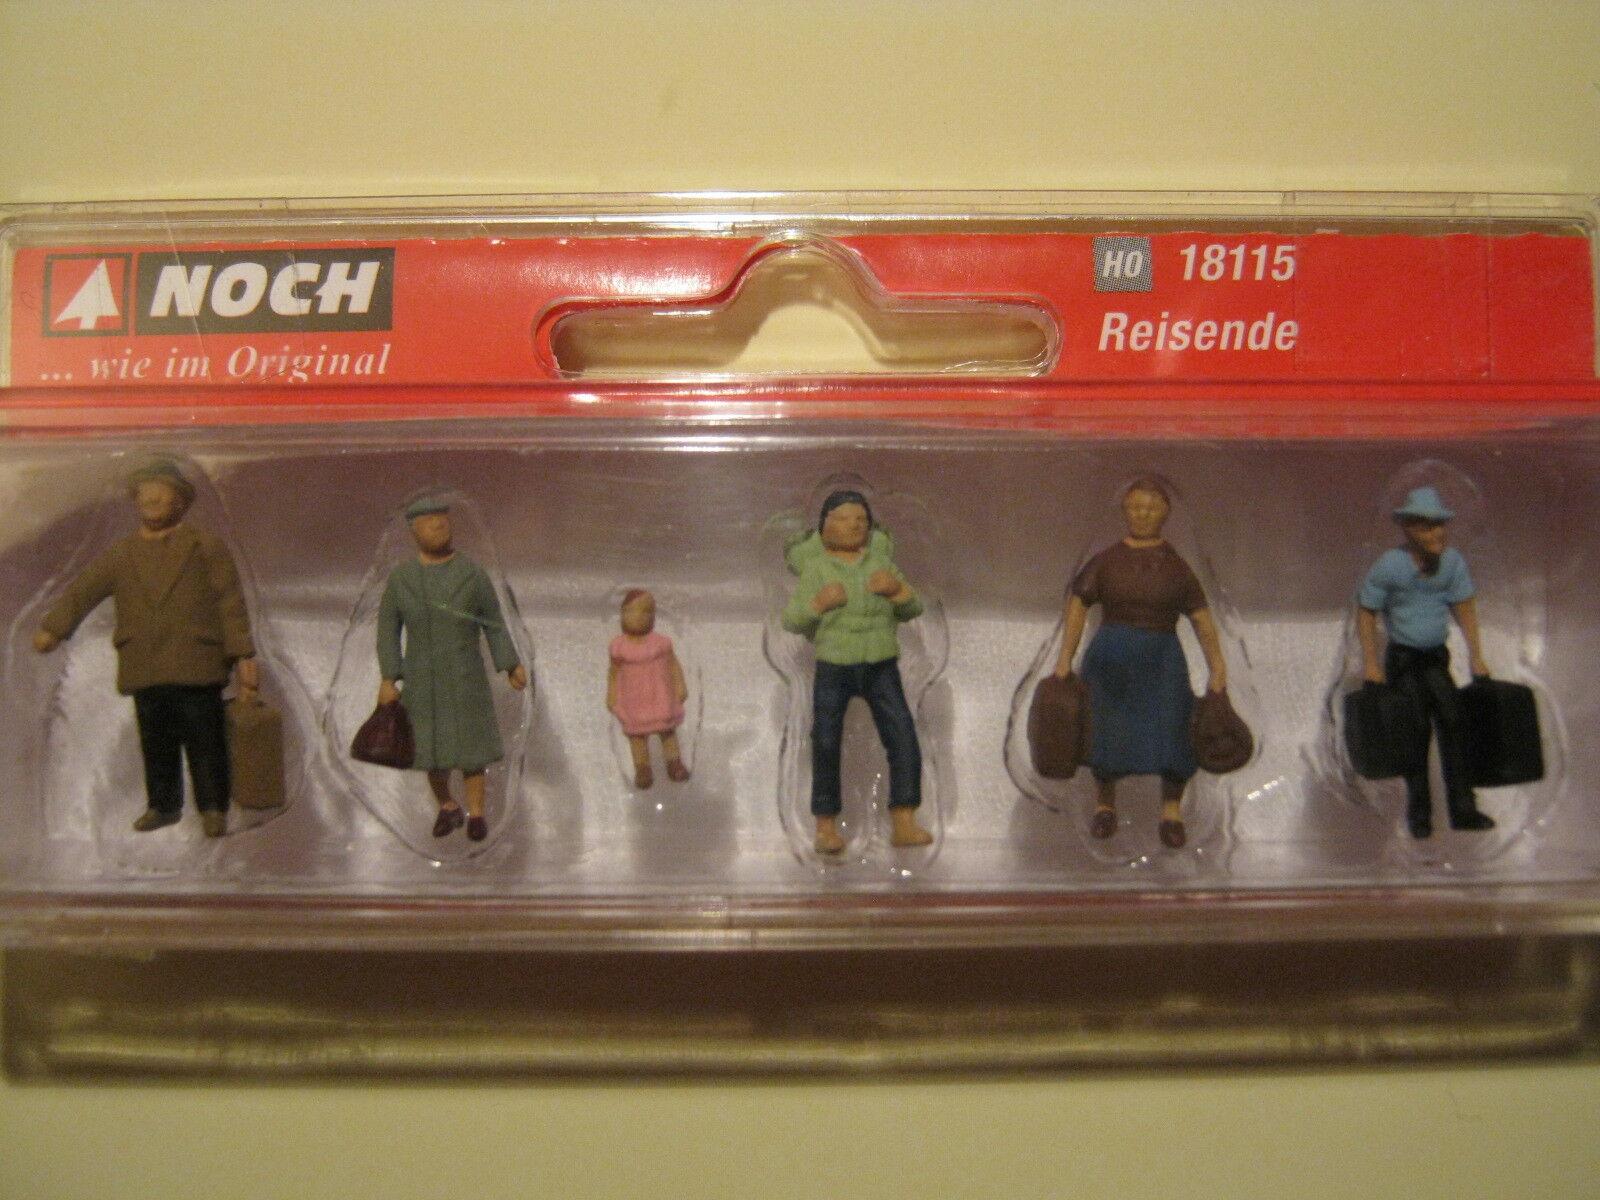 Noch H0 Figuren Figuren Figuren SET BAHNHOF NEU OVP 1 87 Lokführer Personal Reisende Sitzende d879f8